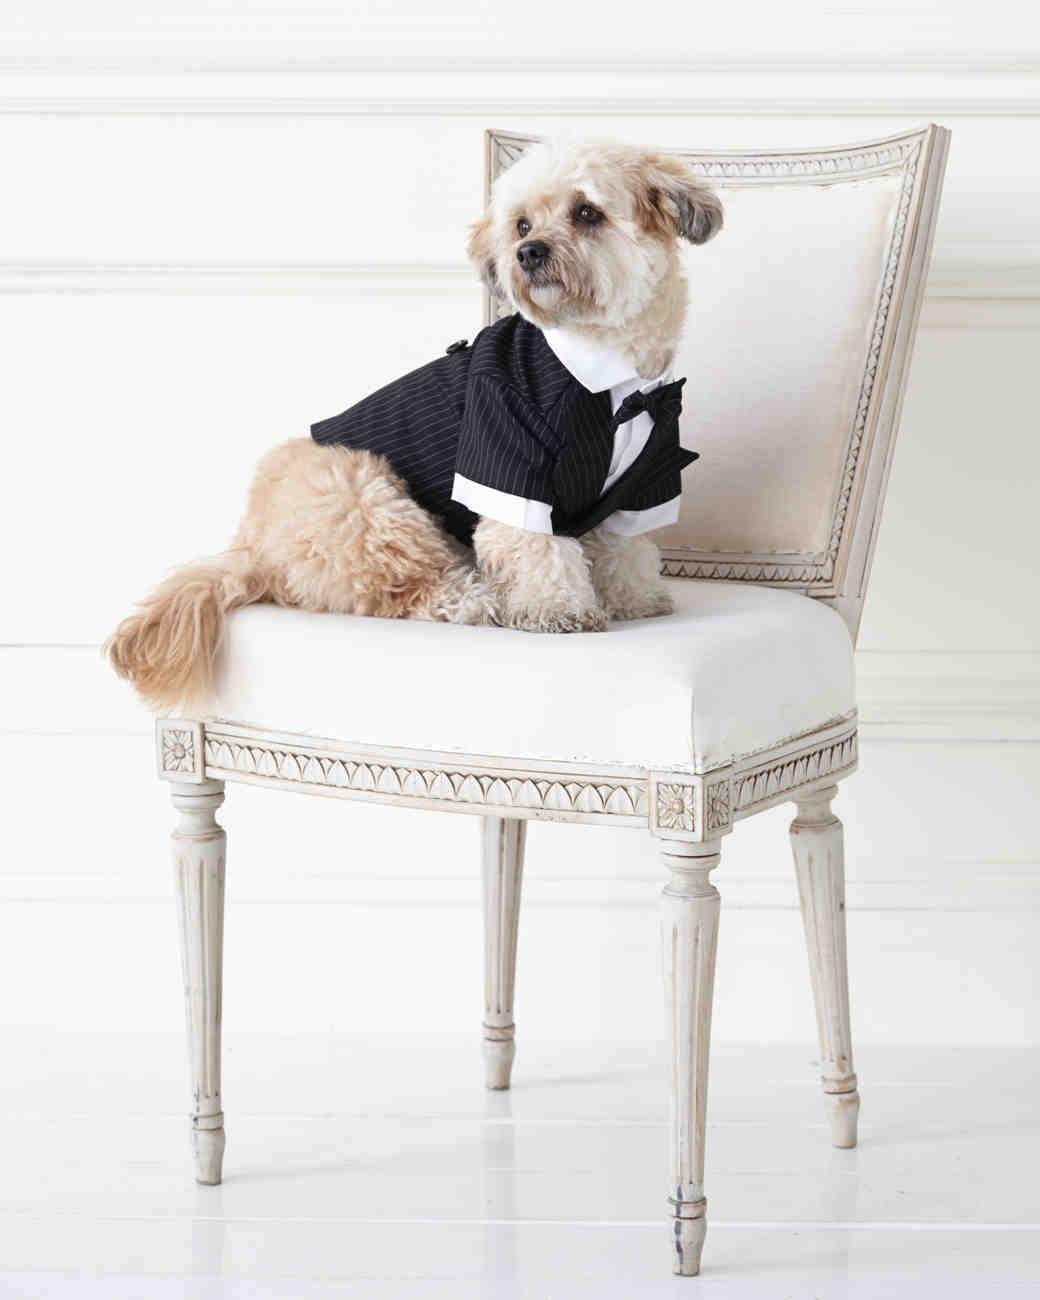 wedding-pet-clothes-mspets-wedding-tuxedo-chair1-0515.jpg